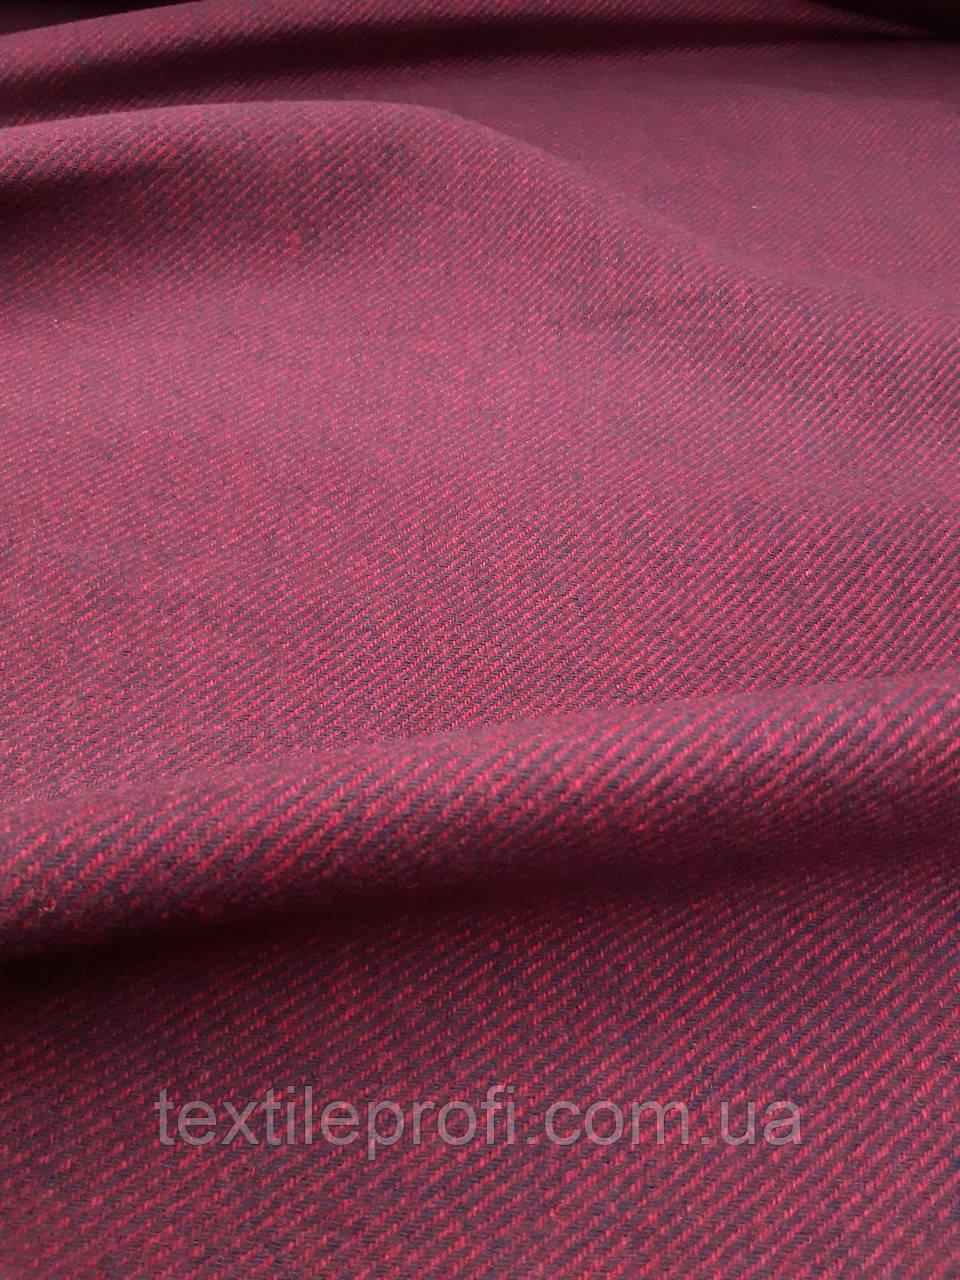 "Пальтовая шерстяная ткань SaRa ""Бордо"", фото 1"